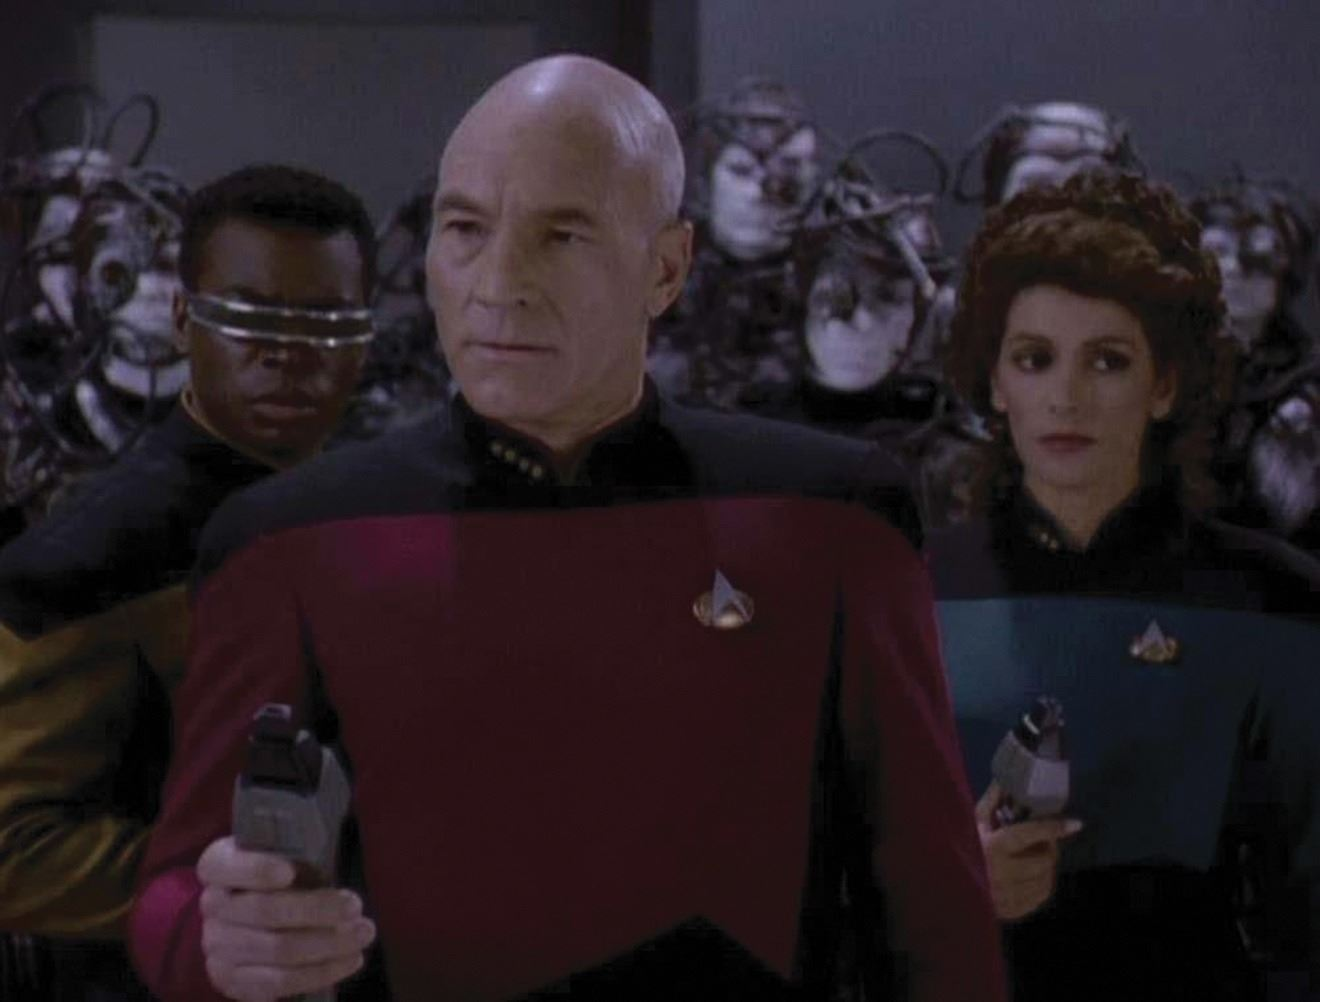 Star Trek The Original Series Rewatch: The Omega Glory